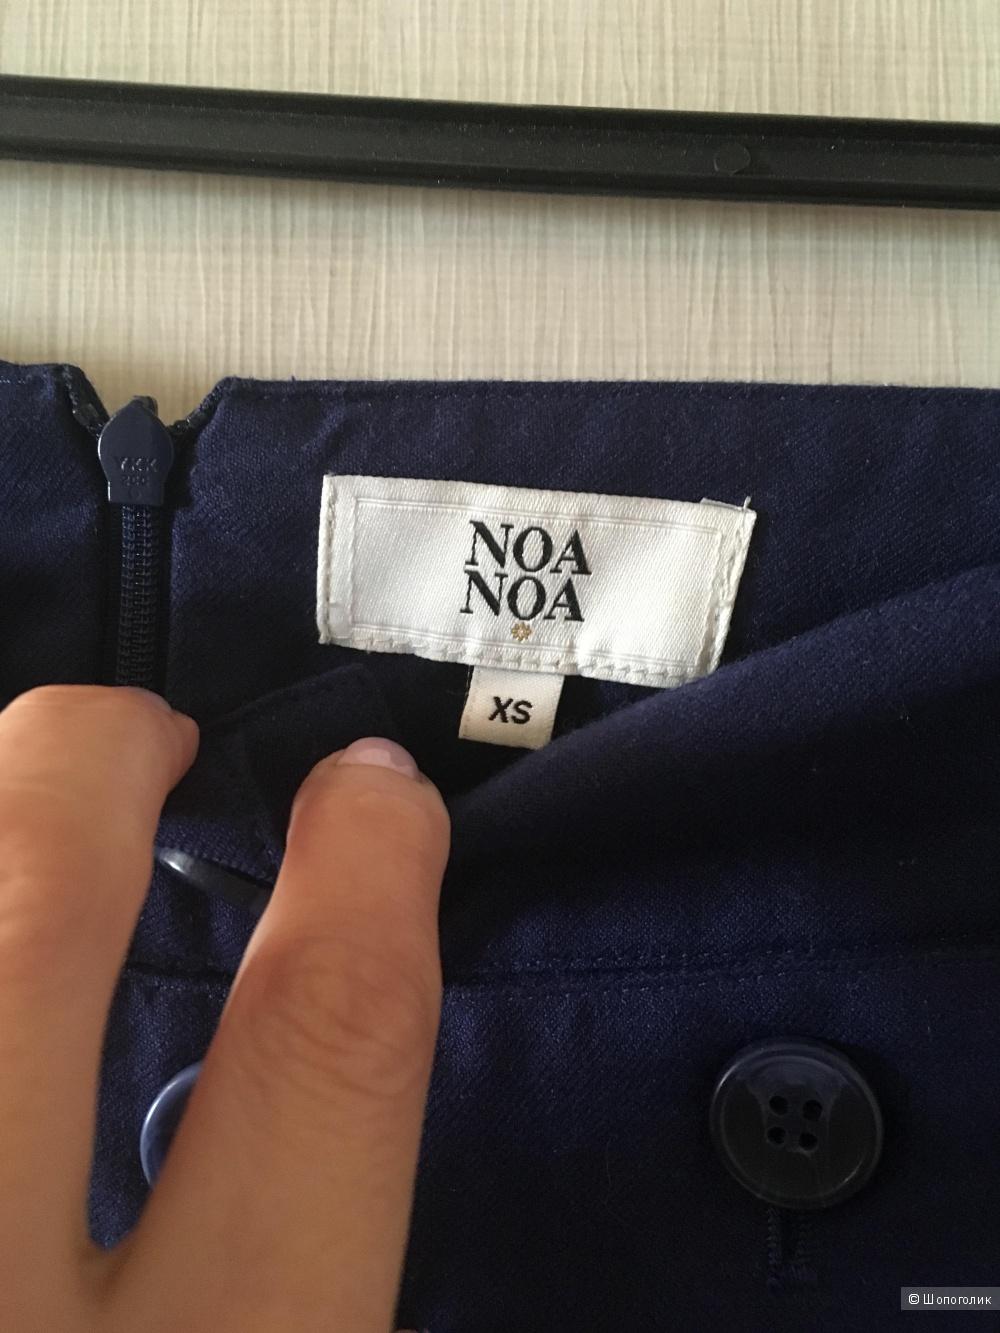 Брюки NOA NOA, размер XS